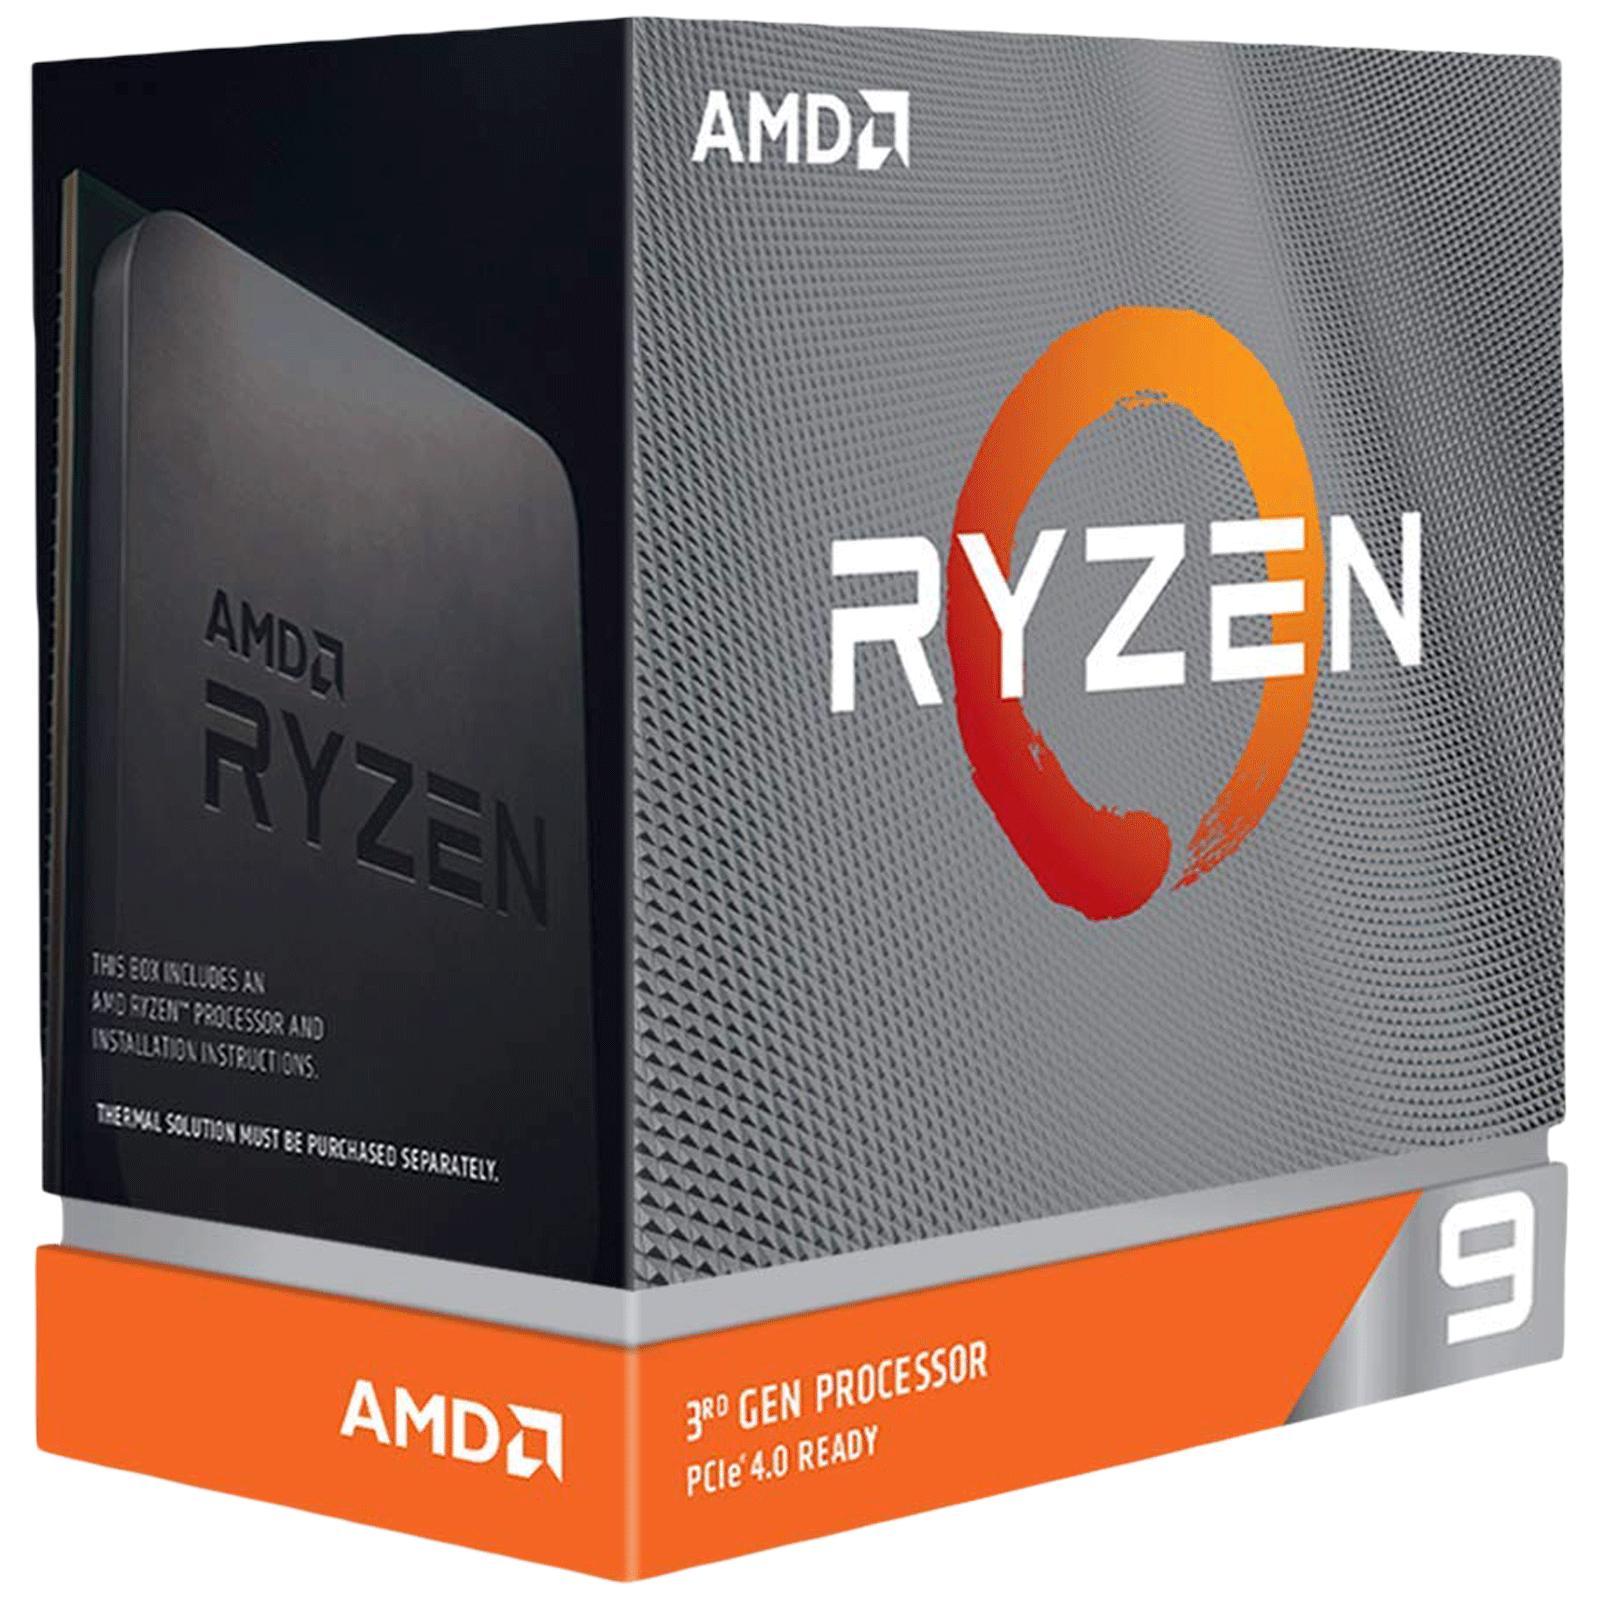 AMD Ryzen 9 Desktop Processor (16 Cores, 3.5GHz, 7nm Zen 2 Architecture, 3950X, Silver)_1